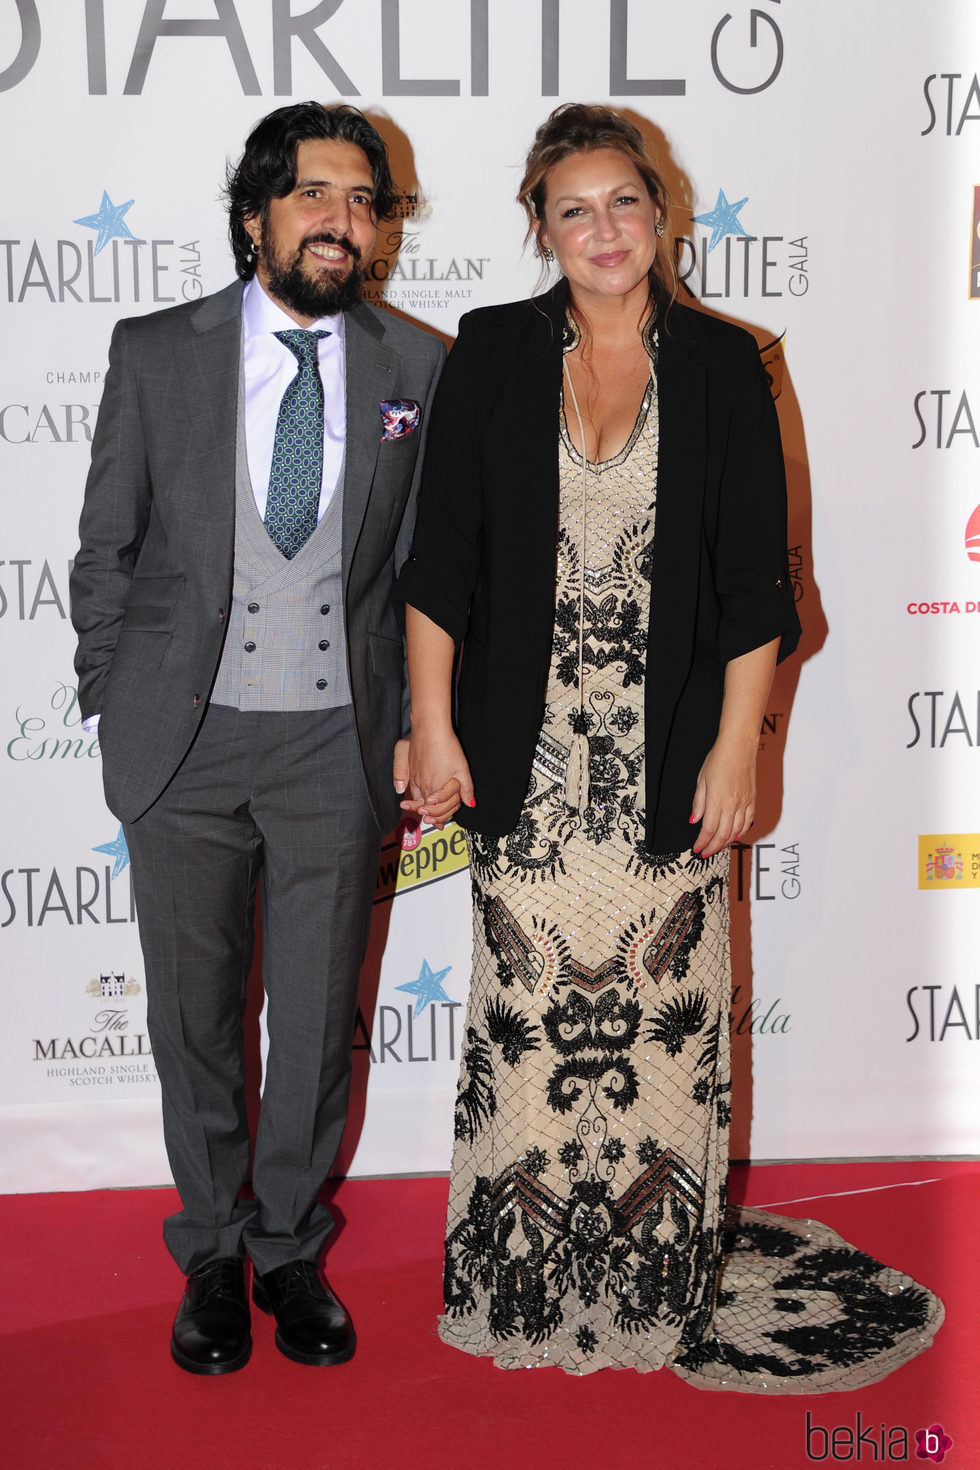 Niña Pastori y Julio Jiménez en la Gala Starlite 2017 en Marbella